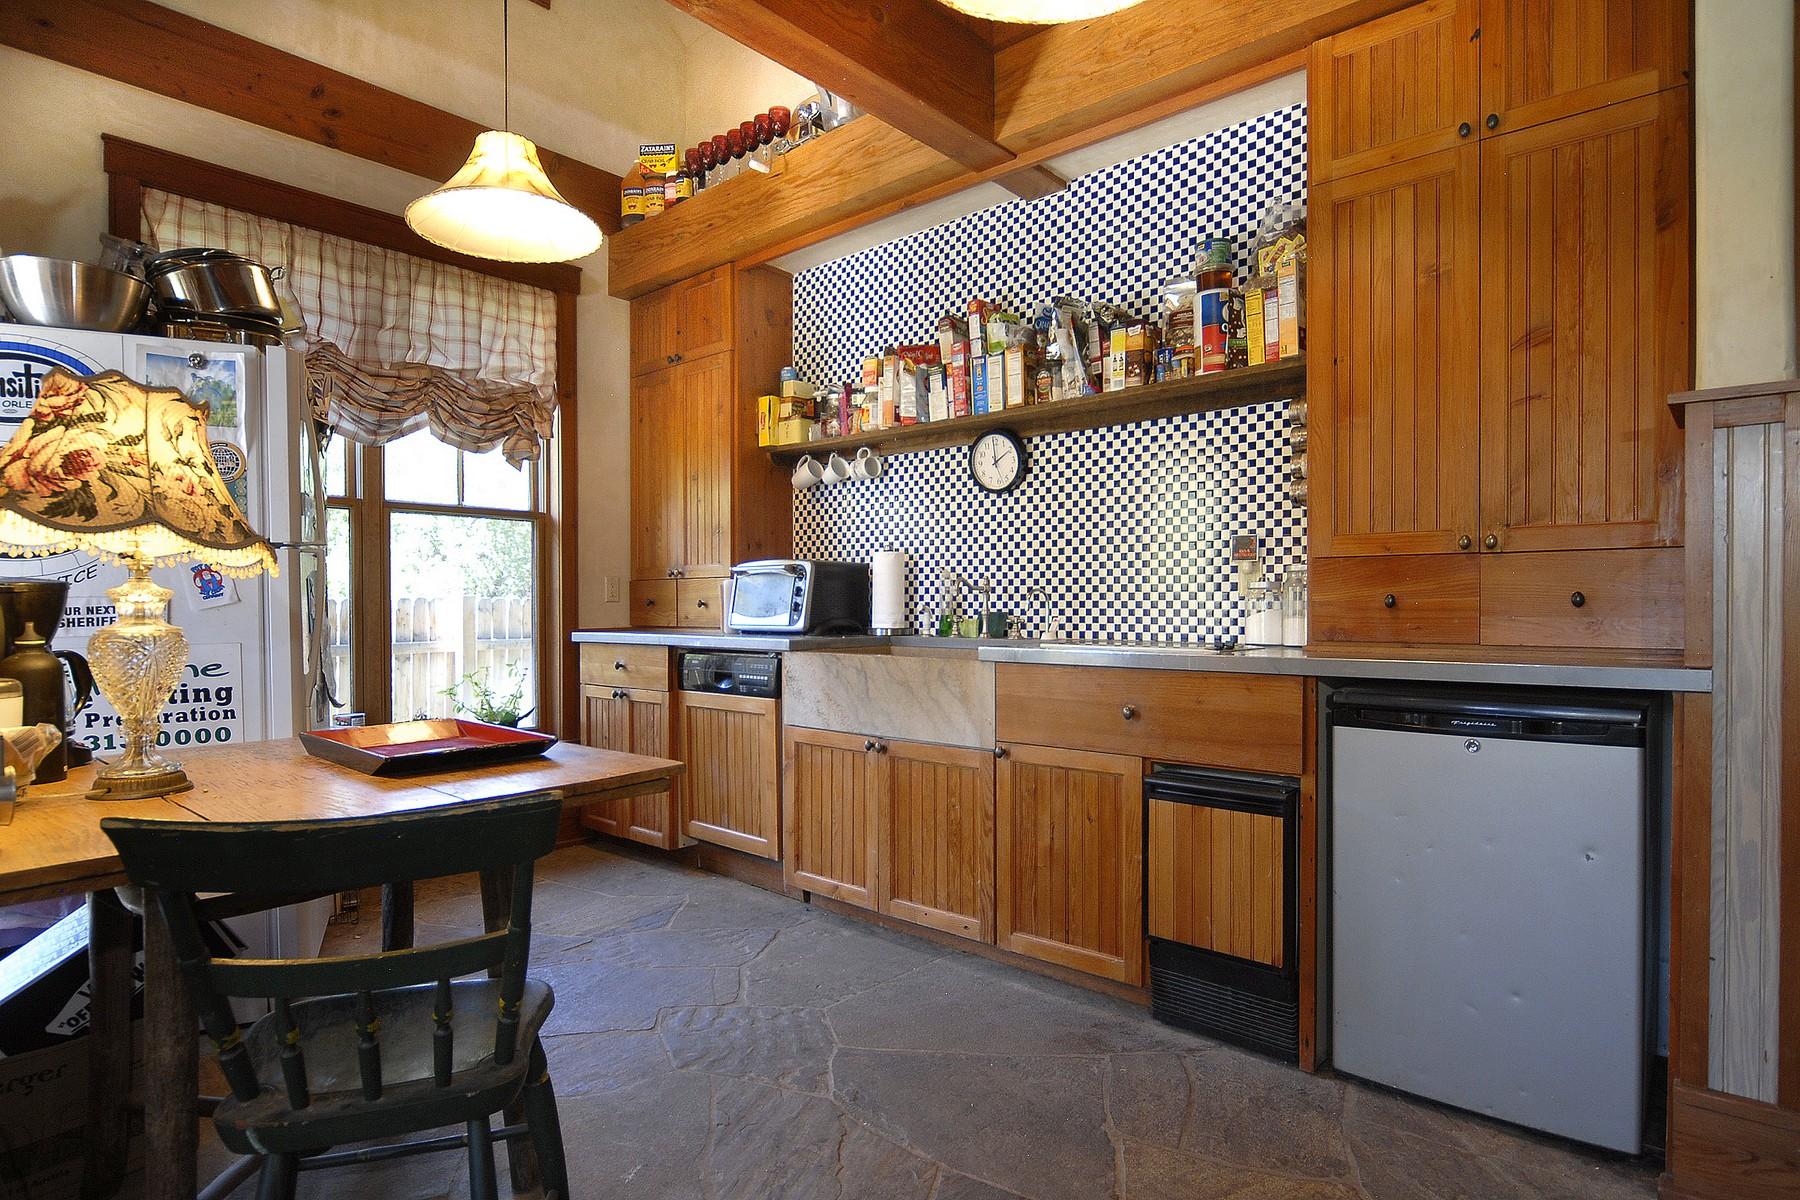 Additional photo for property listing at Fisherman's Fantasy in Aspen 179 Liberty Lane, Woody Creek, Colorado 81656 Estados Unidos